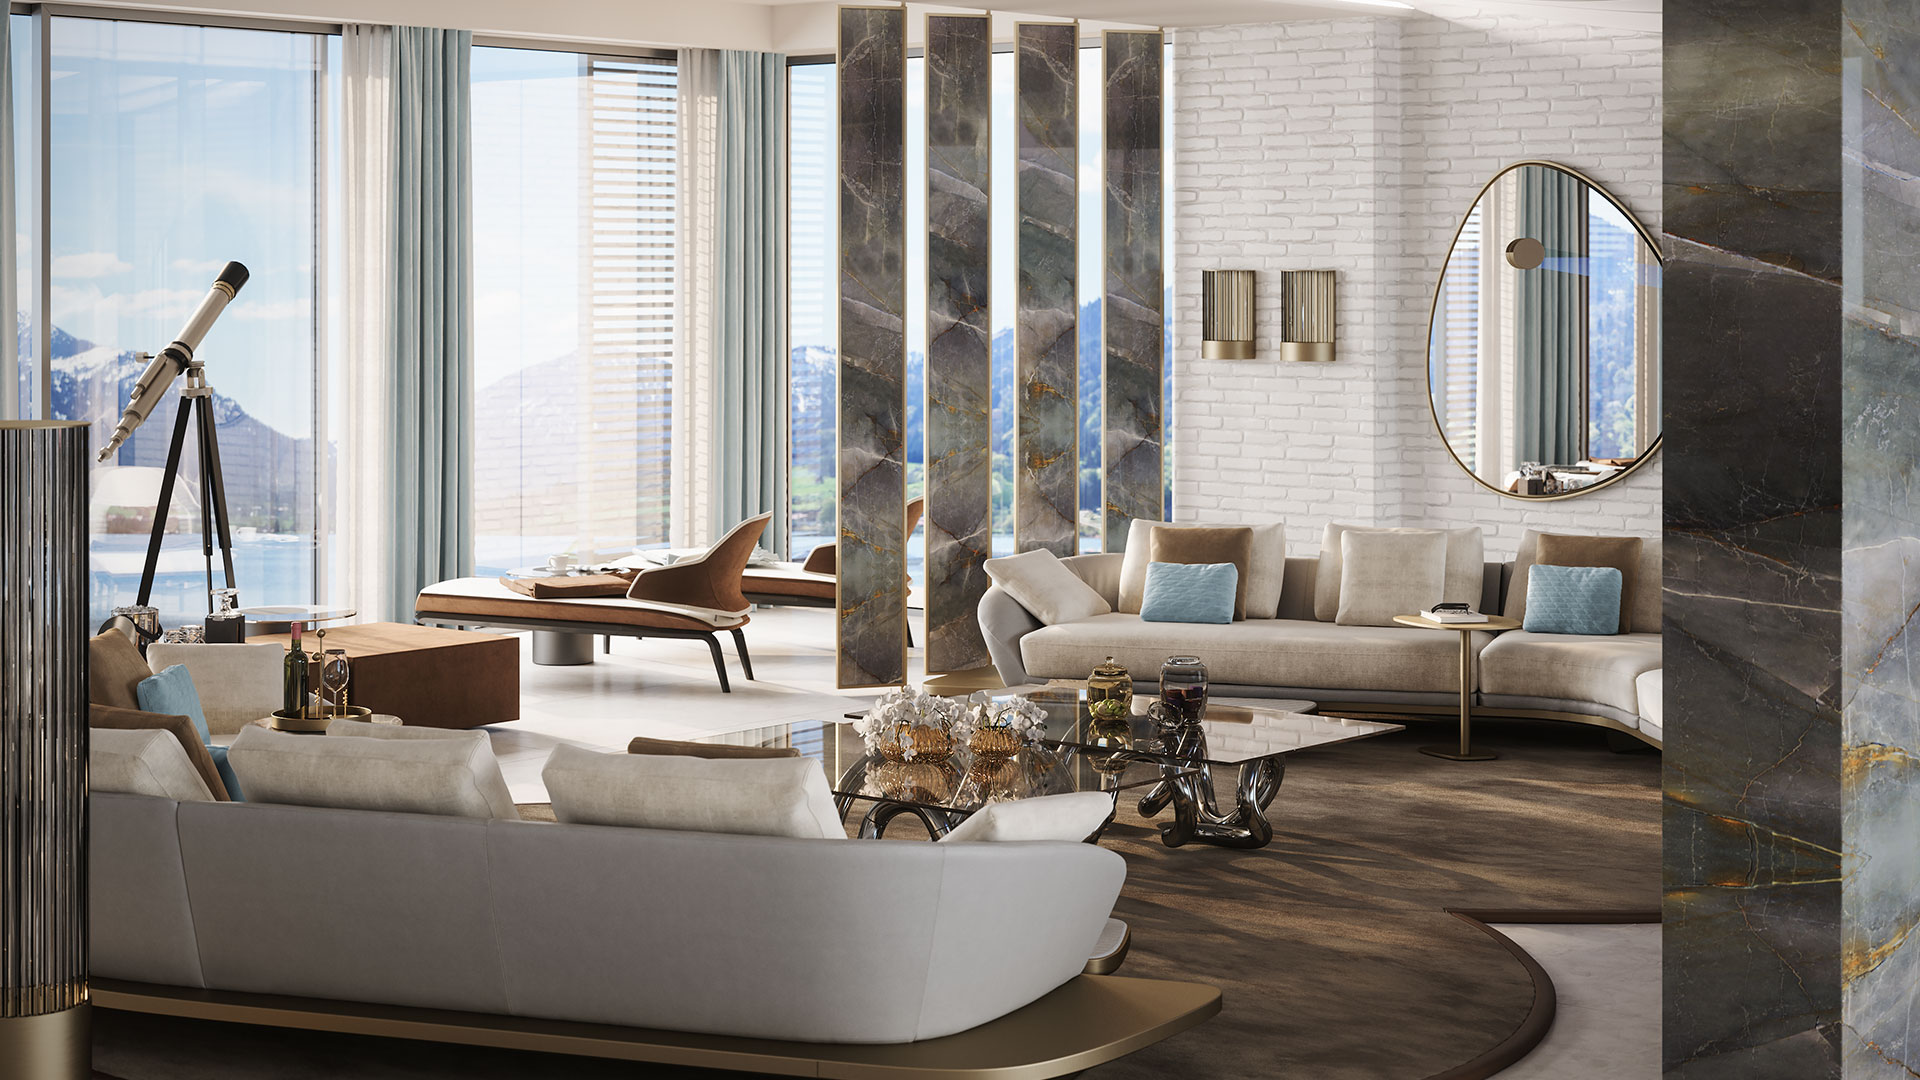 8622_livingroom-01-casa-pininfarina-reflex-home-designdotjpg